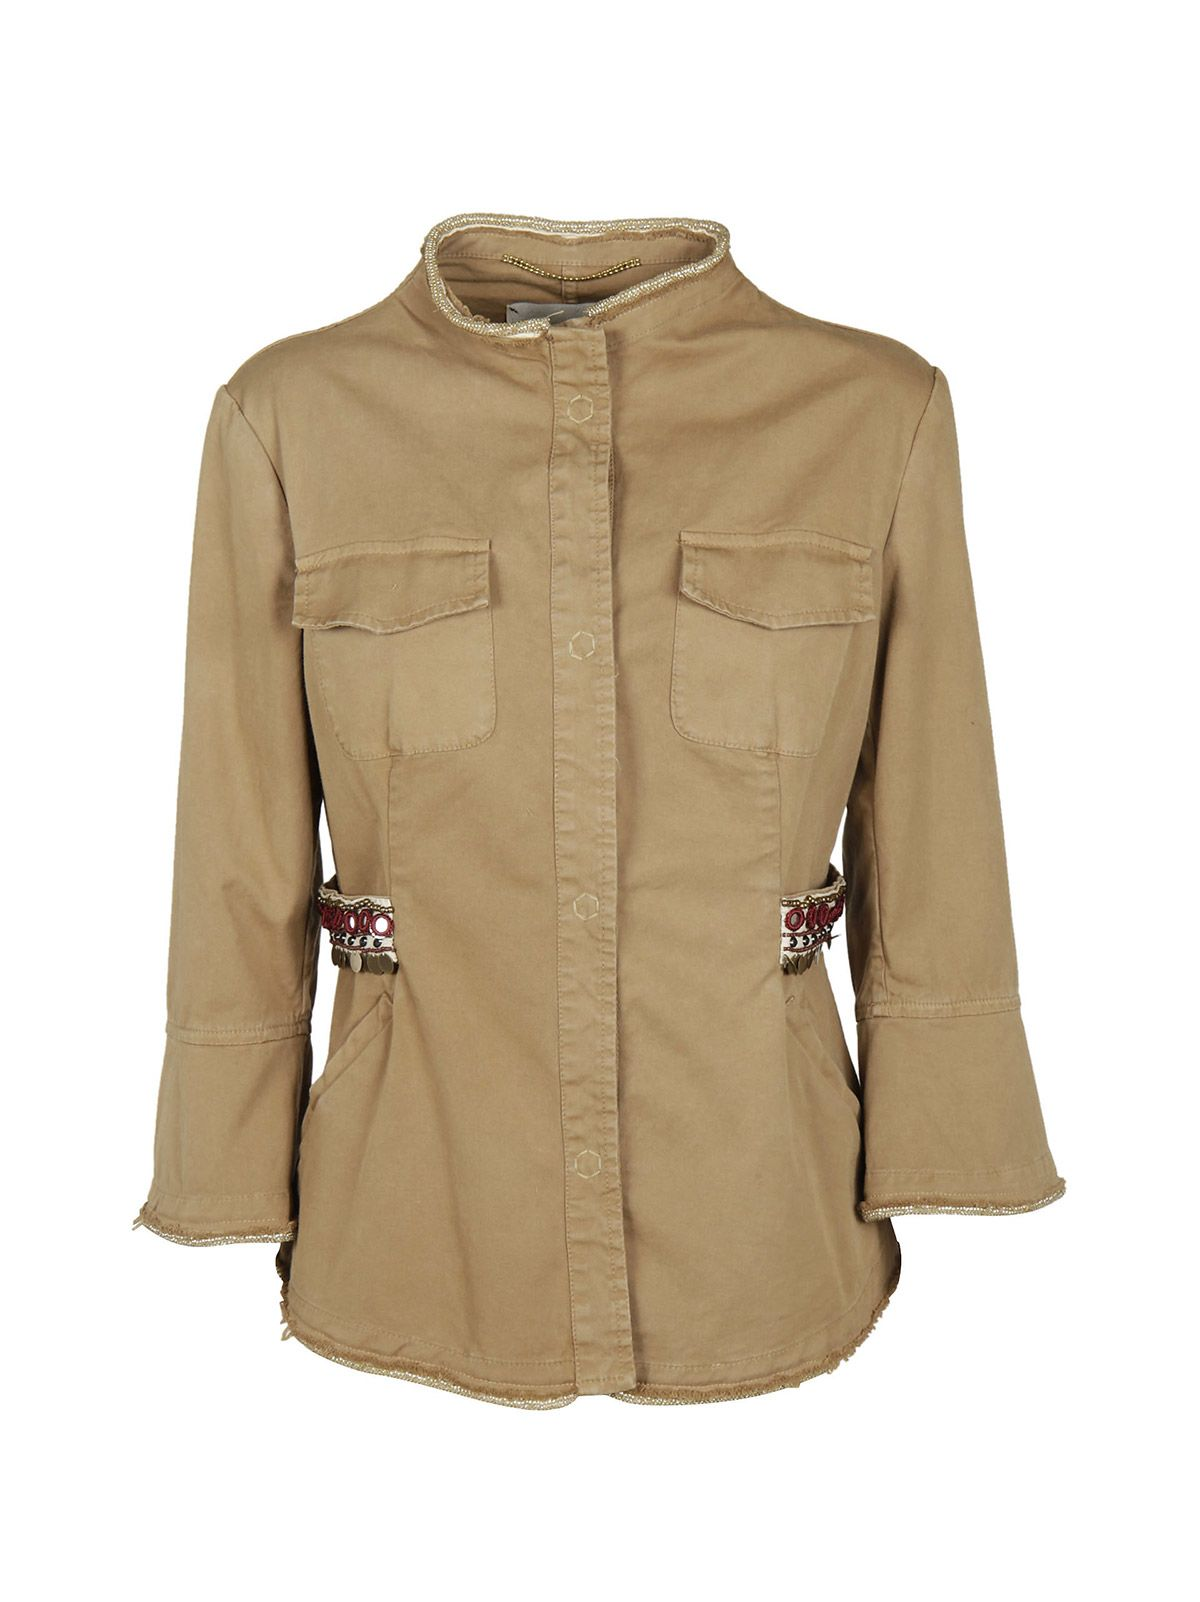 Breast Pocket Shirt